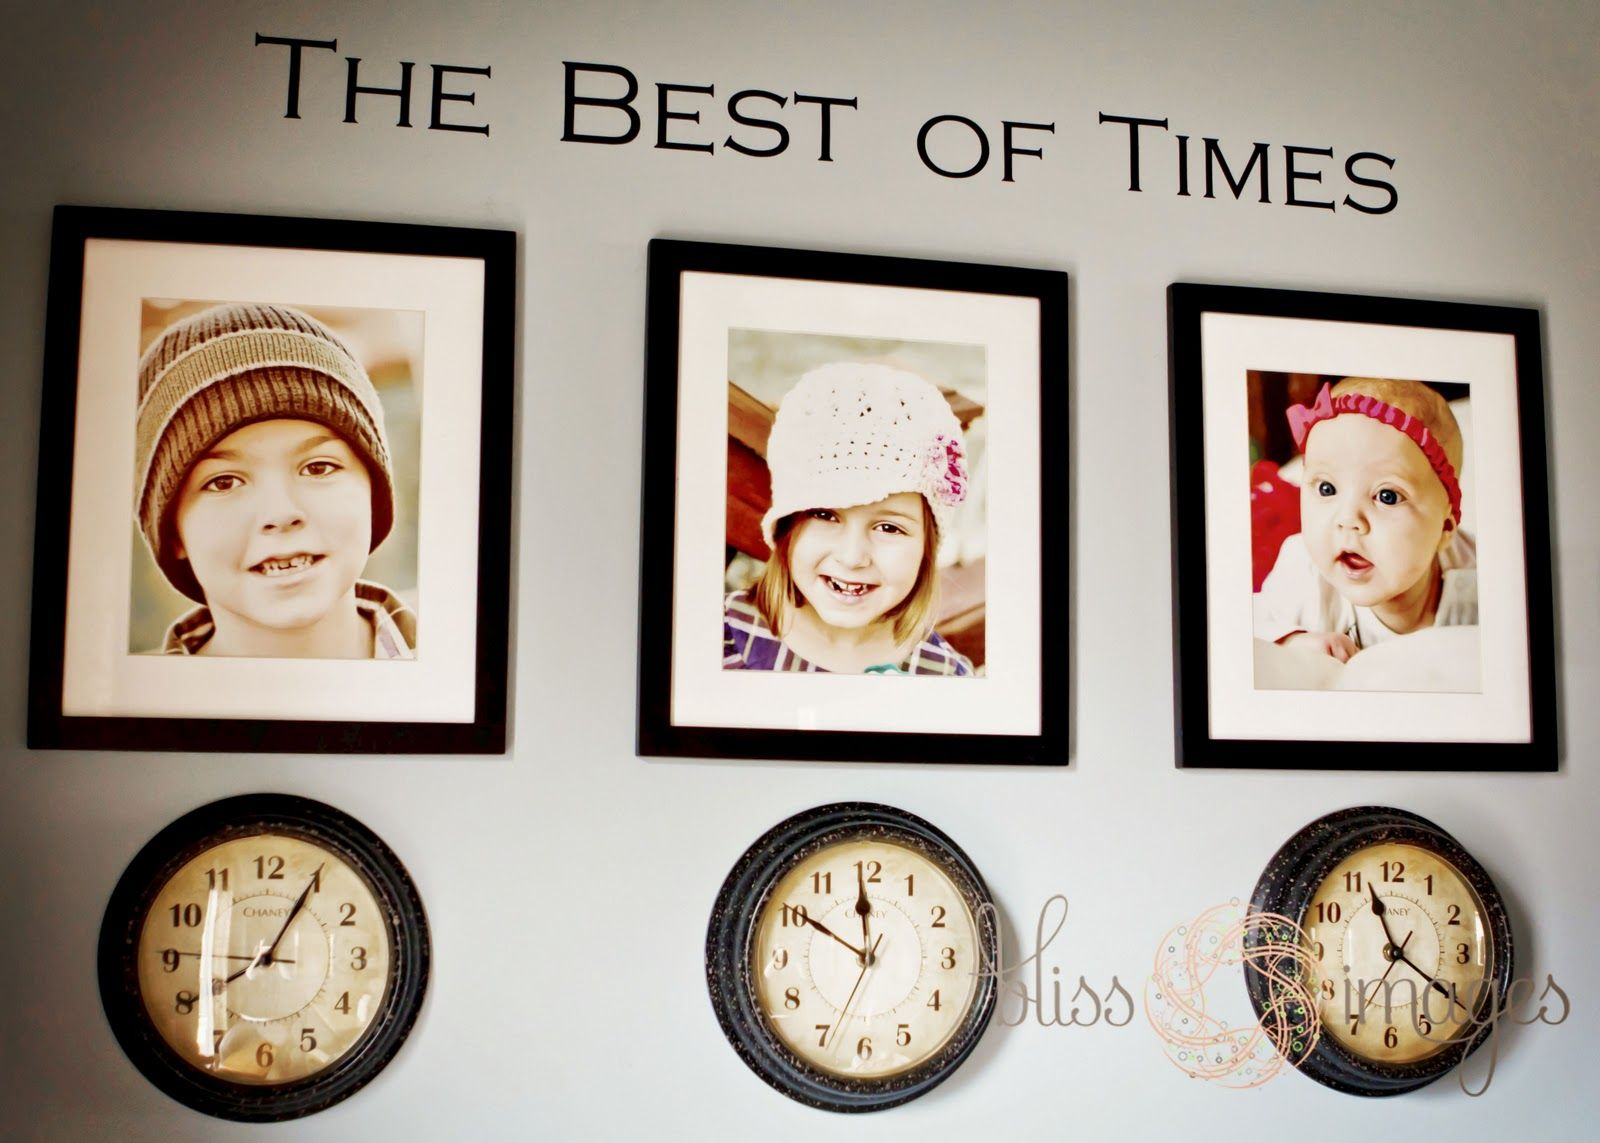 Cute idea for photo wall pics and birthtimes ideas for kiddos cute idea for photo wall pics and birthtimes jeuxipadfo Images